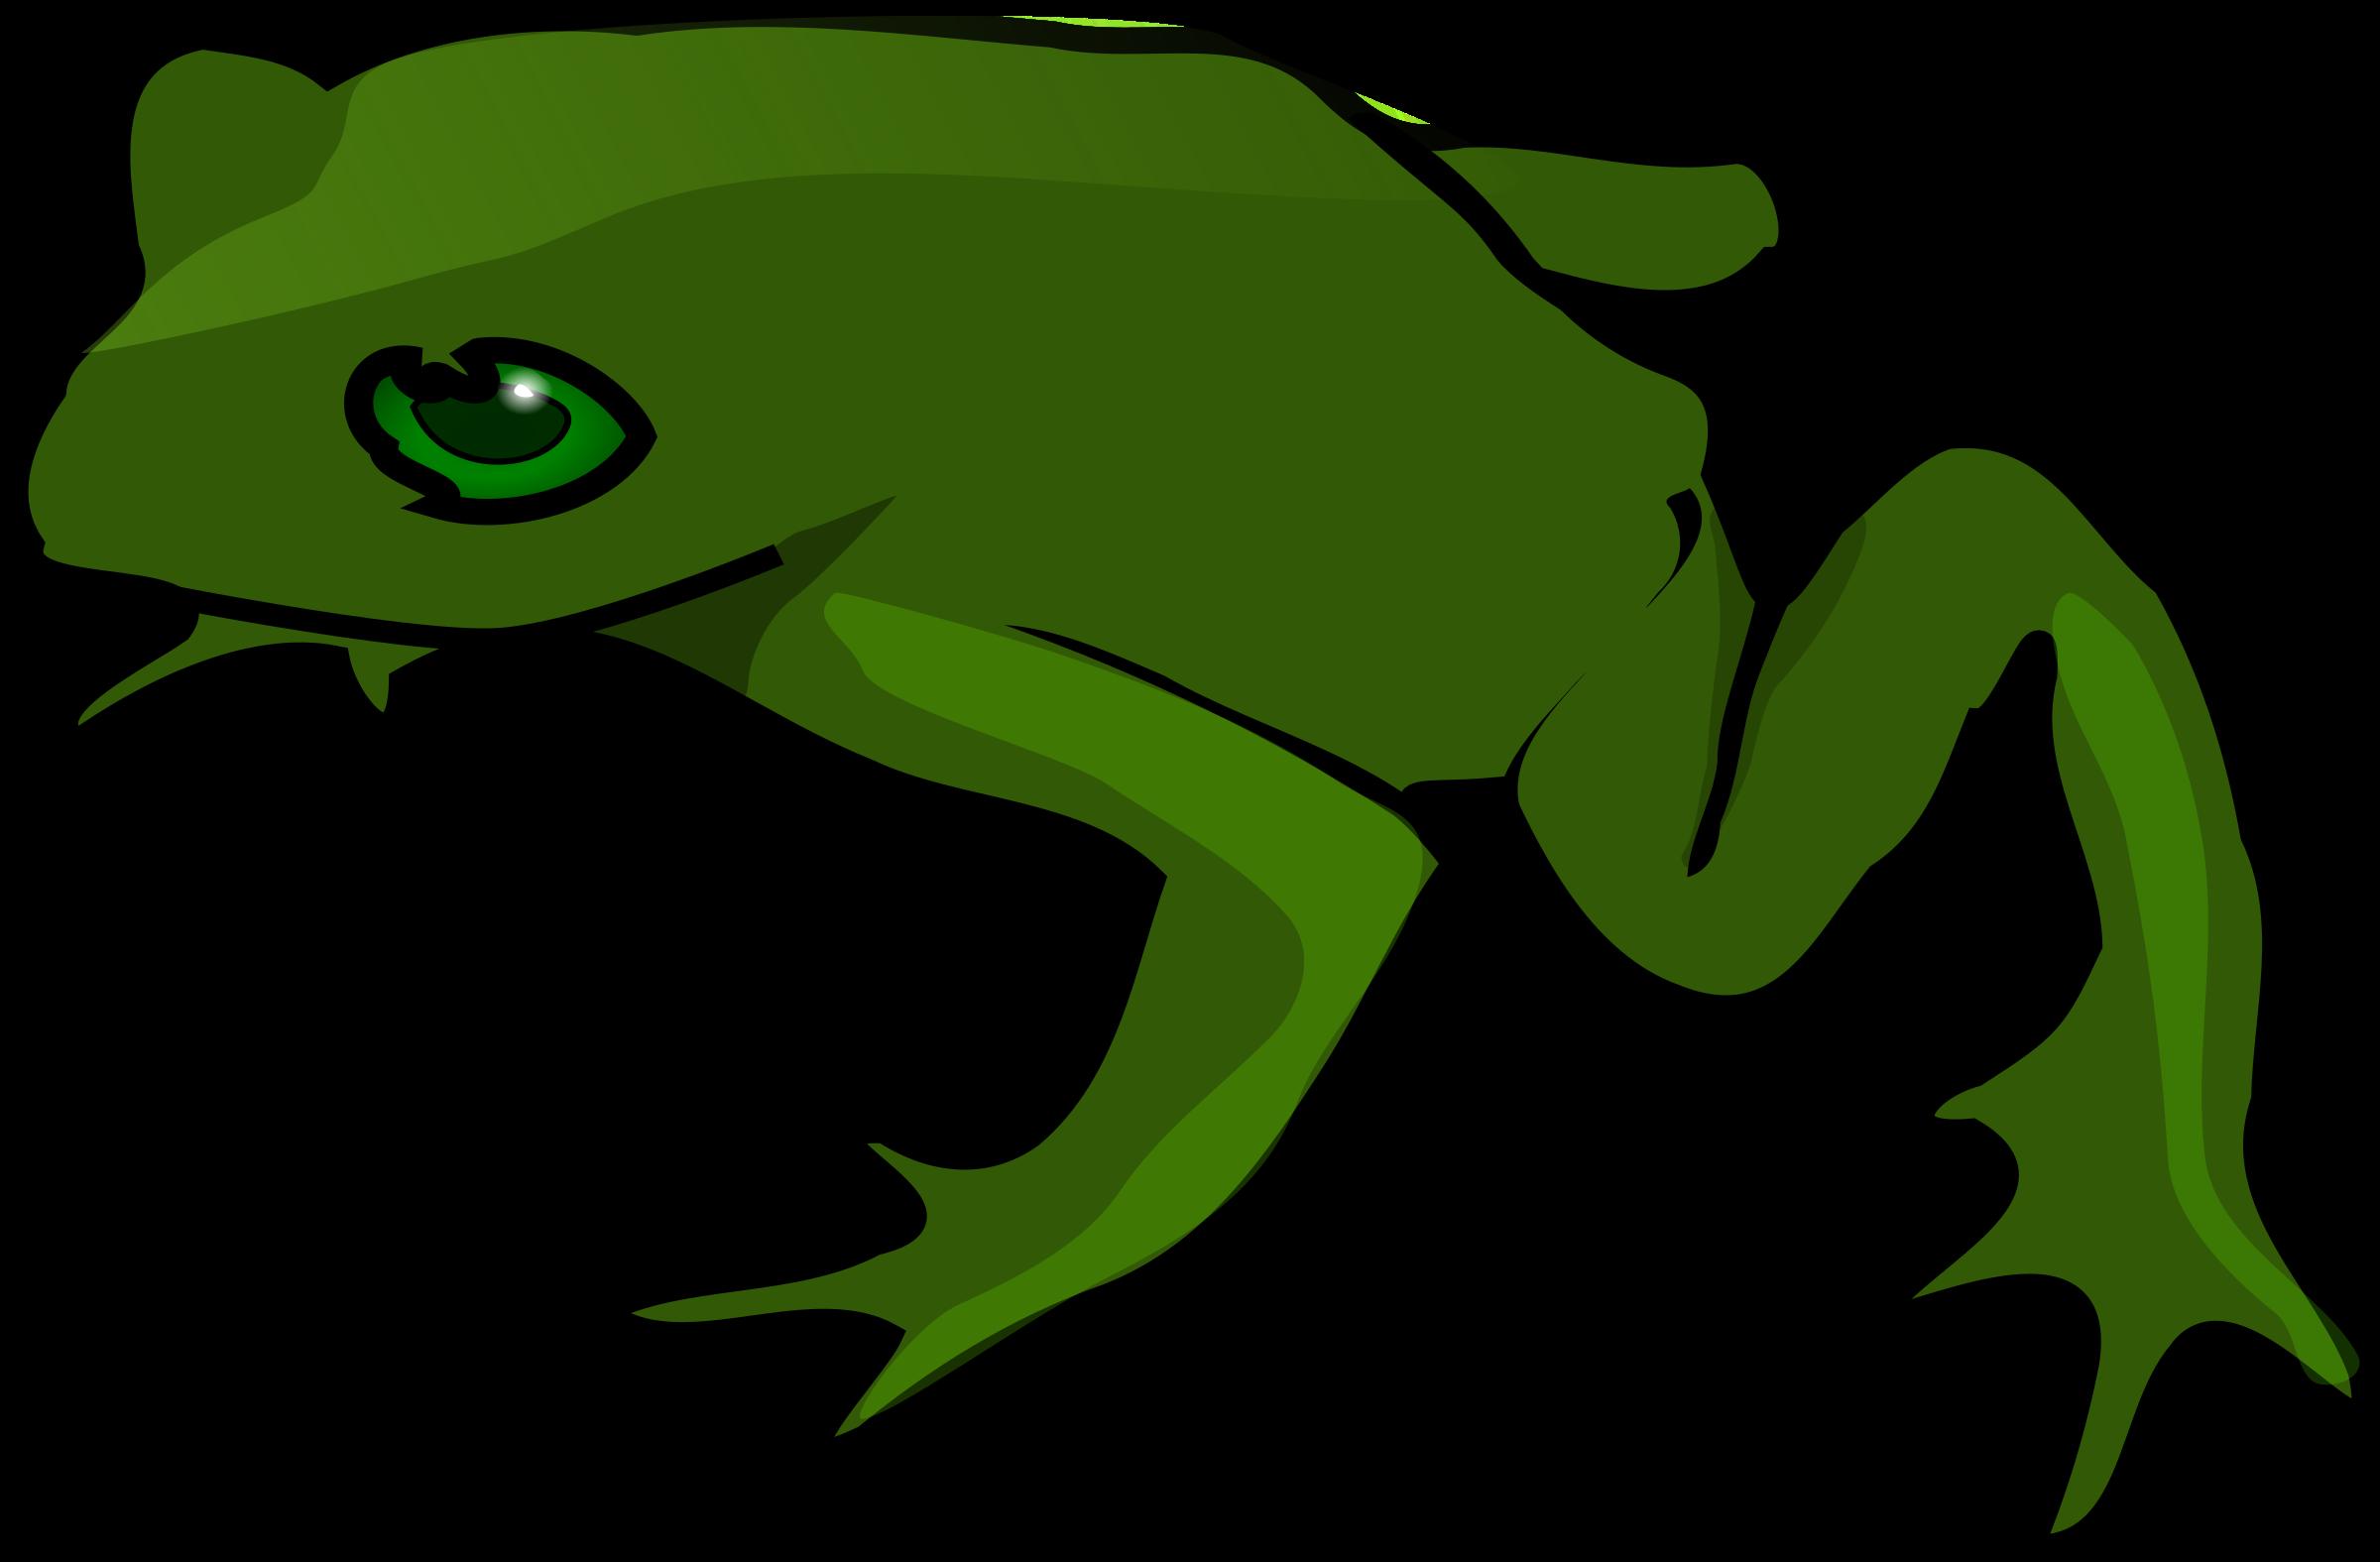 Frog clipart sign. Big image png